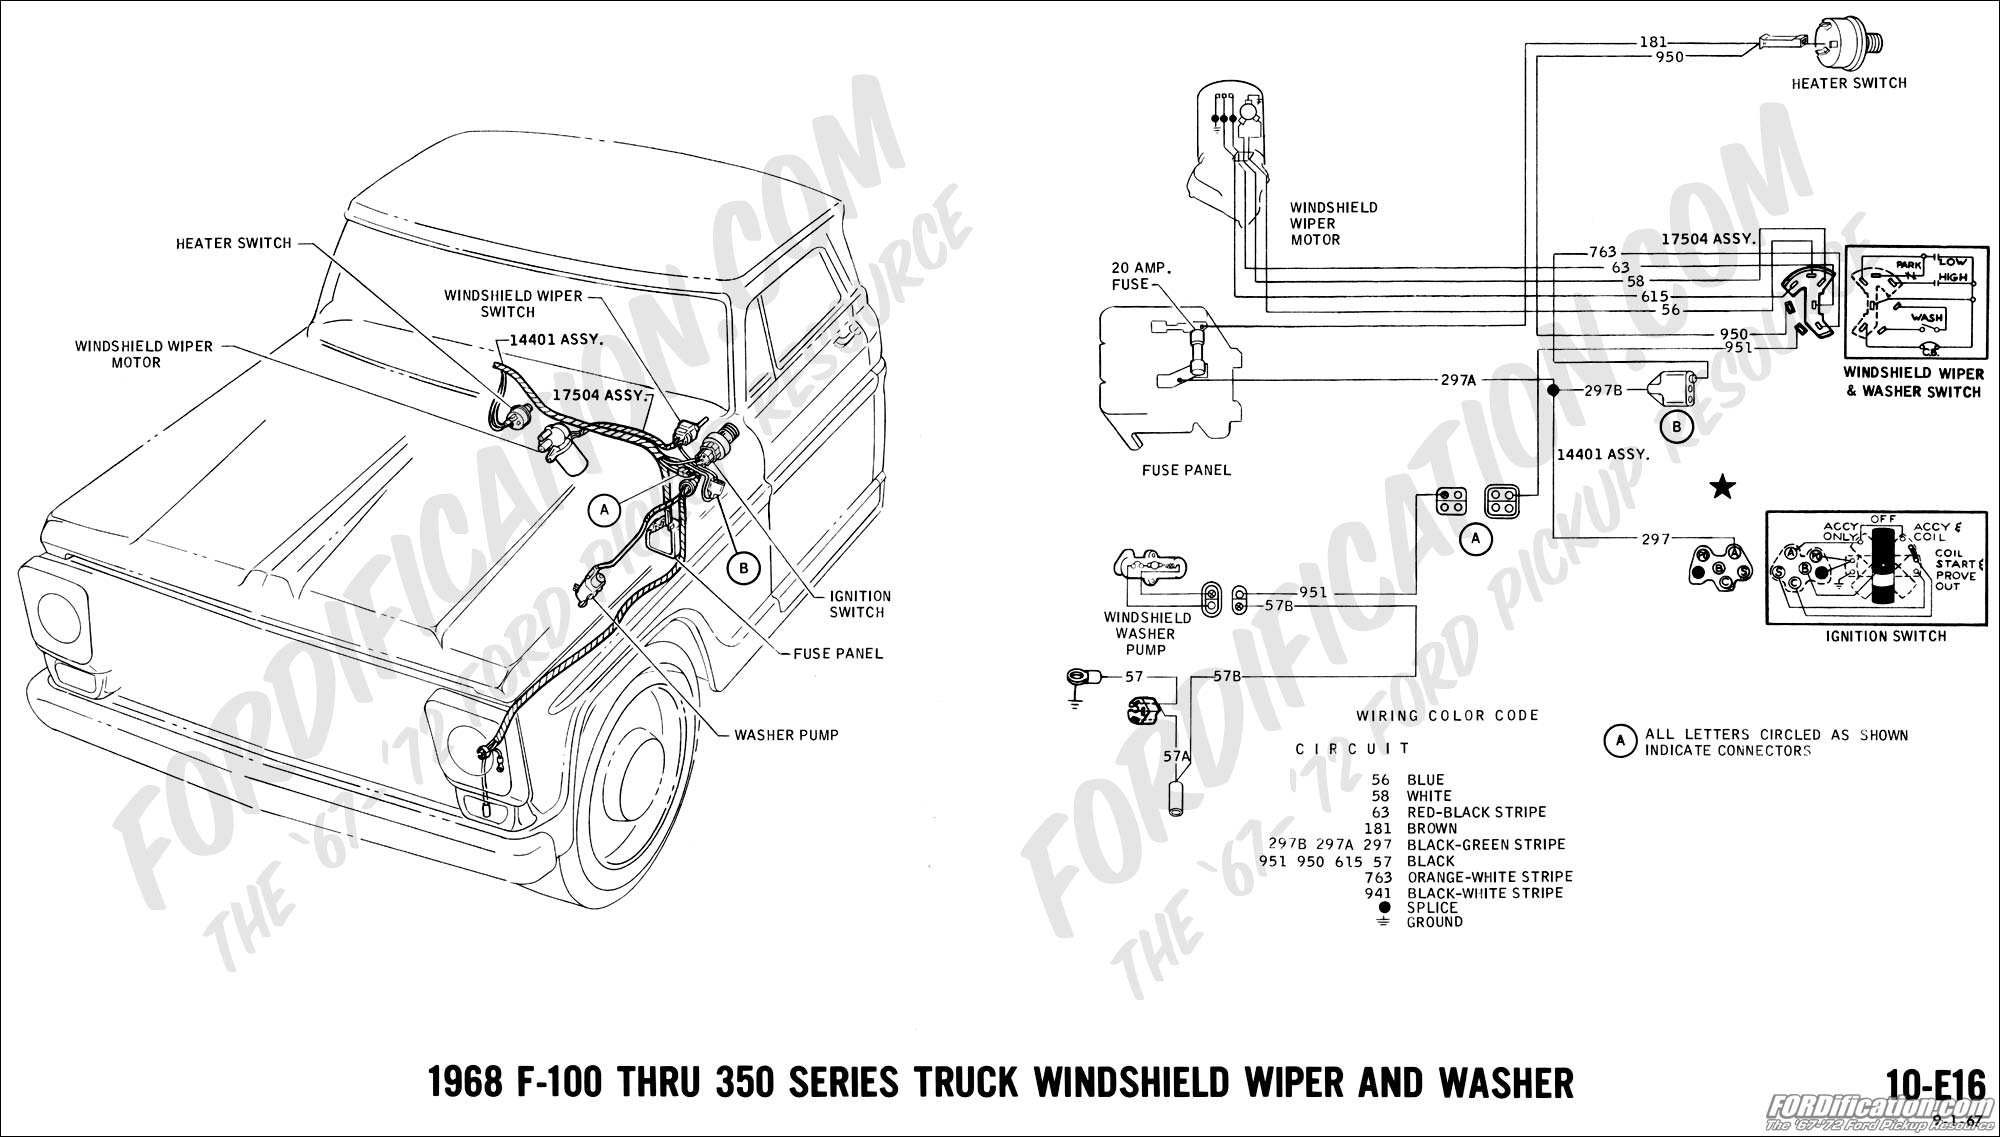 2003 Ford Ranger Xl Wiring Diagram. factory tachometer